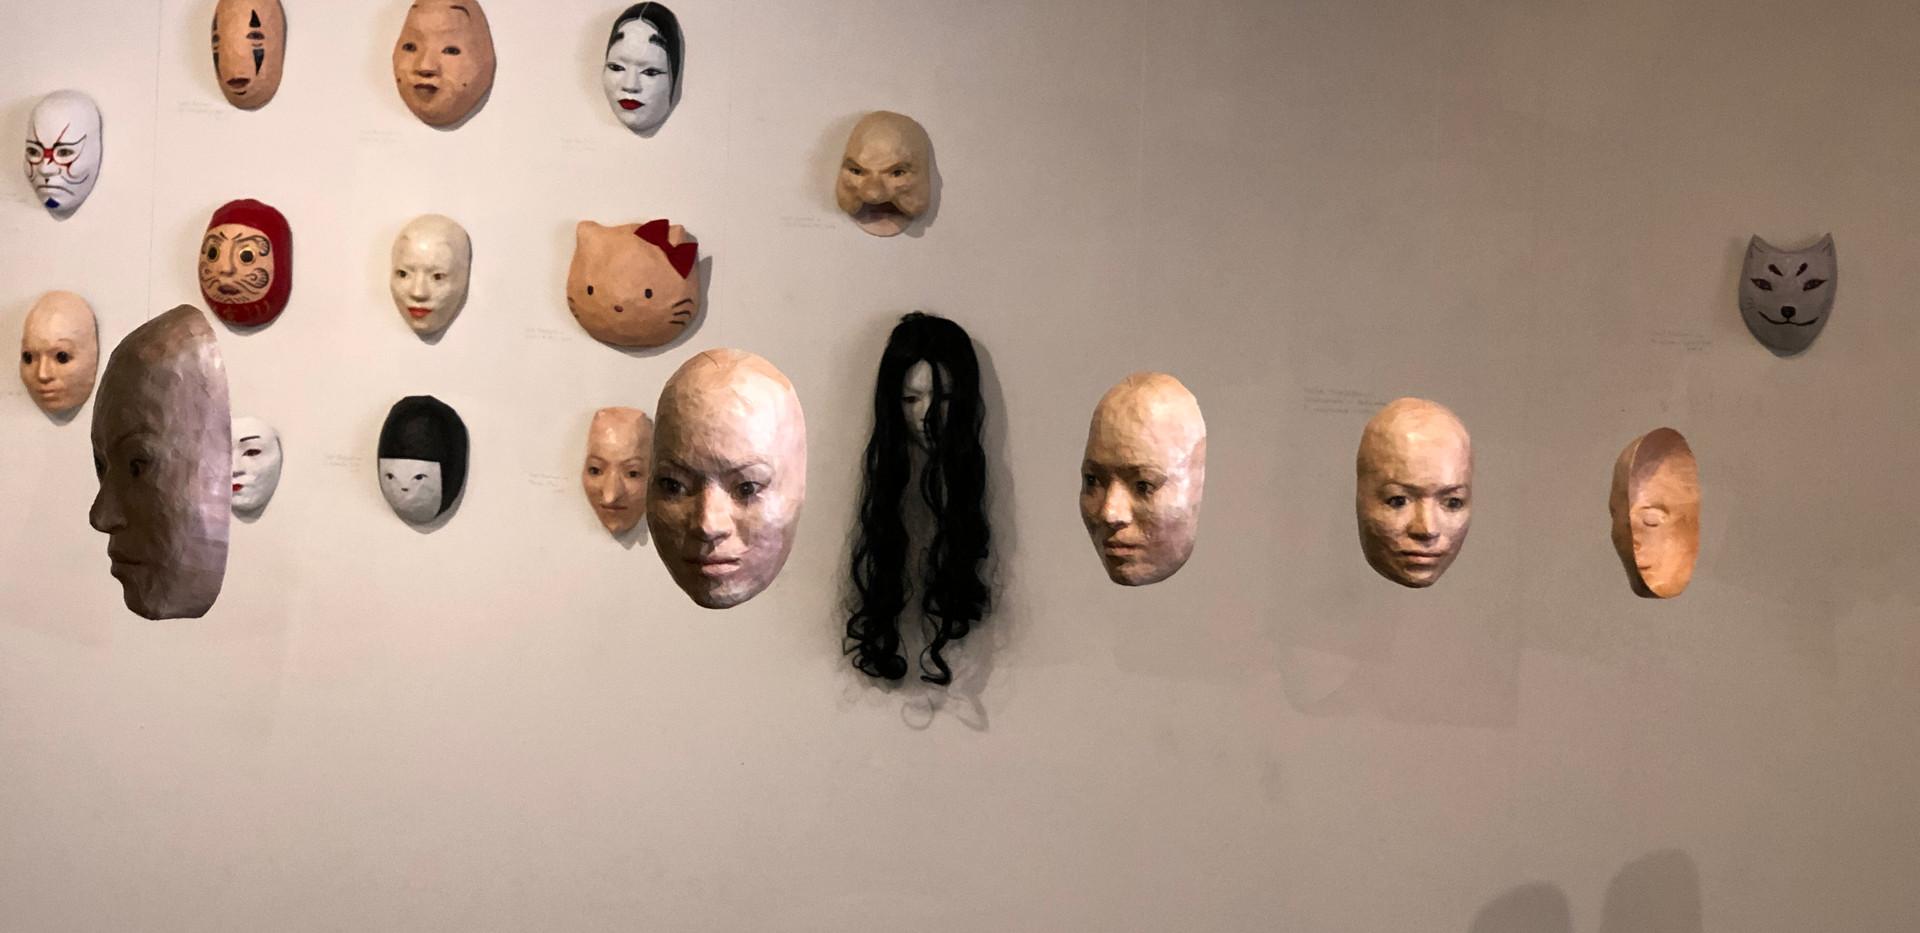 MTurnbull-Mask Exhibit at JCCC 5